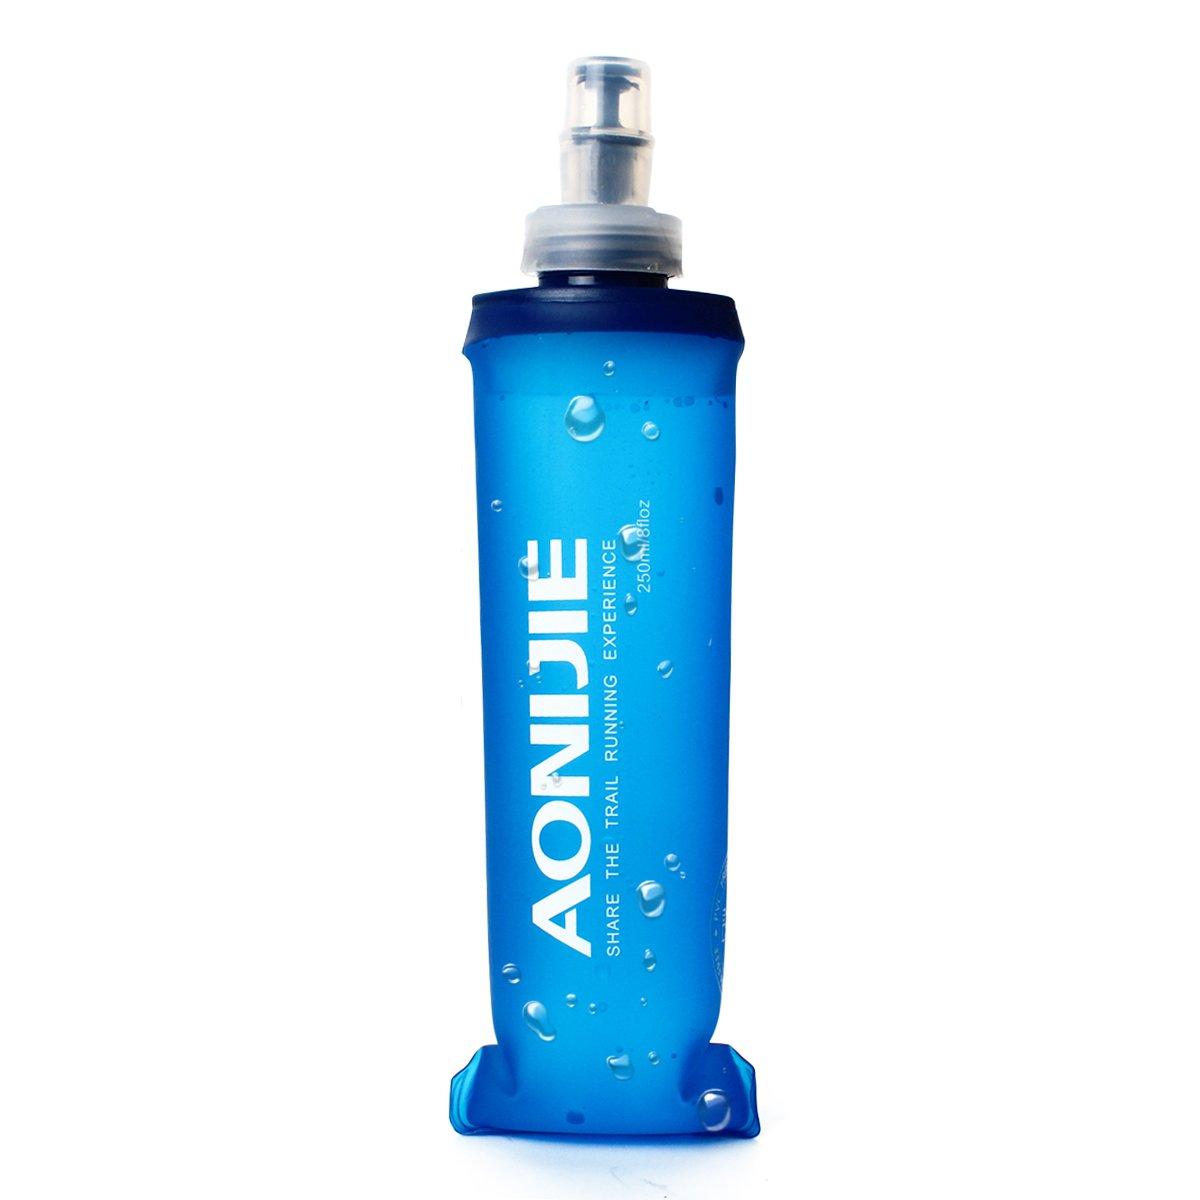 Geila Hidratació n ligero plegable libre de BPA botella de agua del bolso suave Frasco para el Deporte Running Senderismo (250ML) Geila Co. Ltd